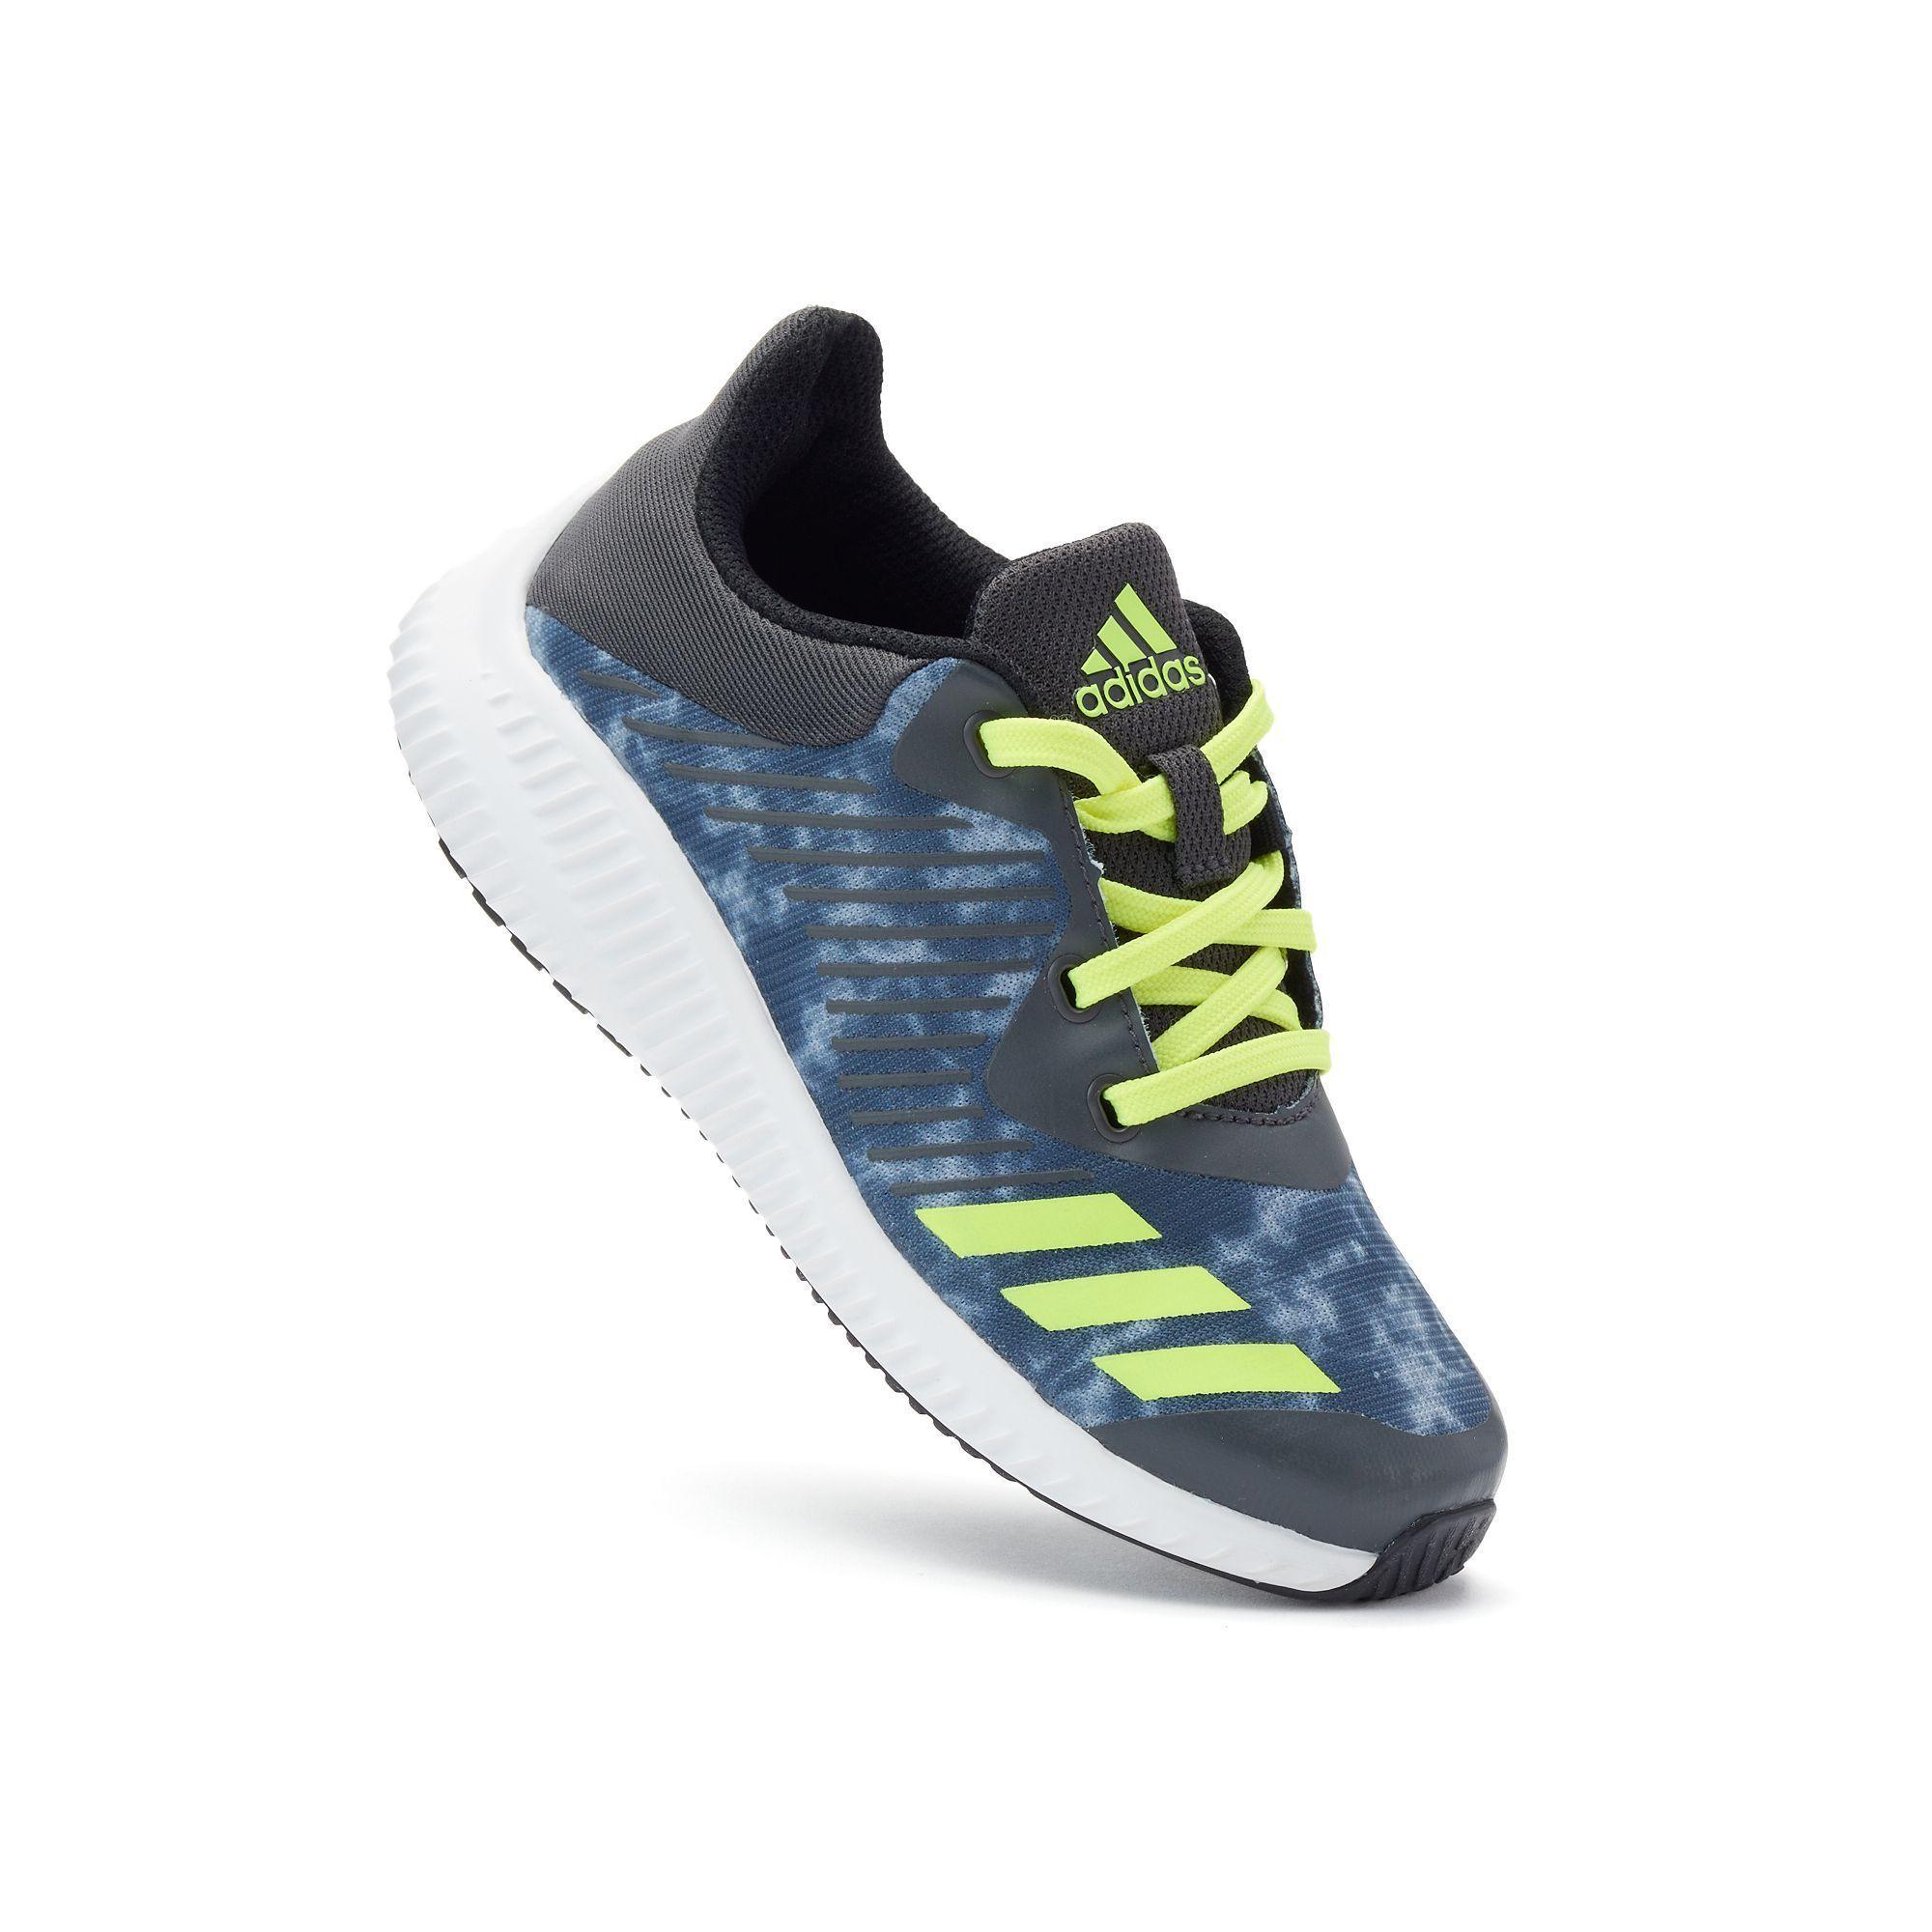 size 6 adidas trainers boys